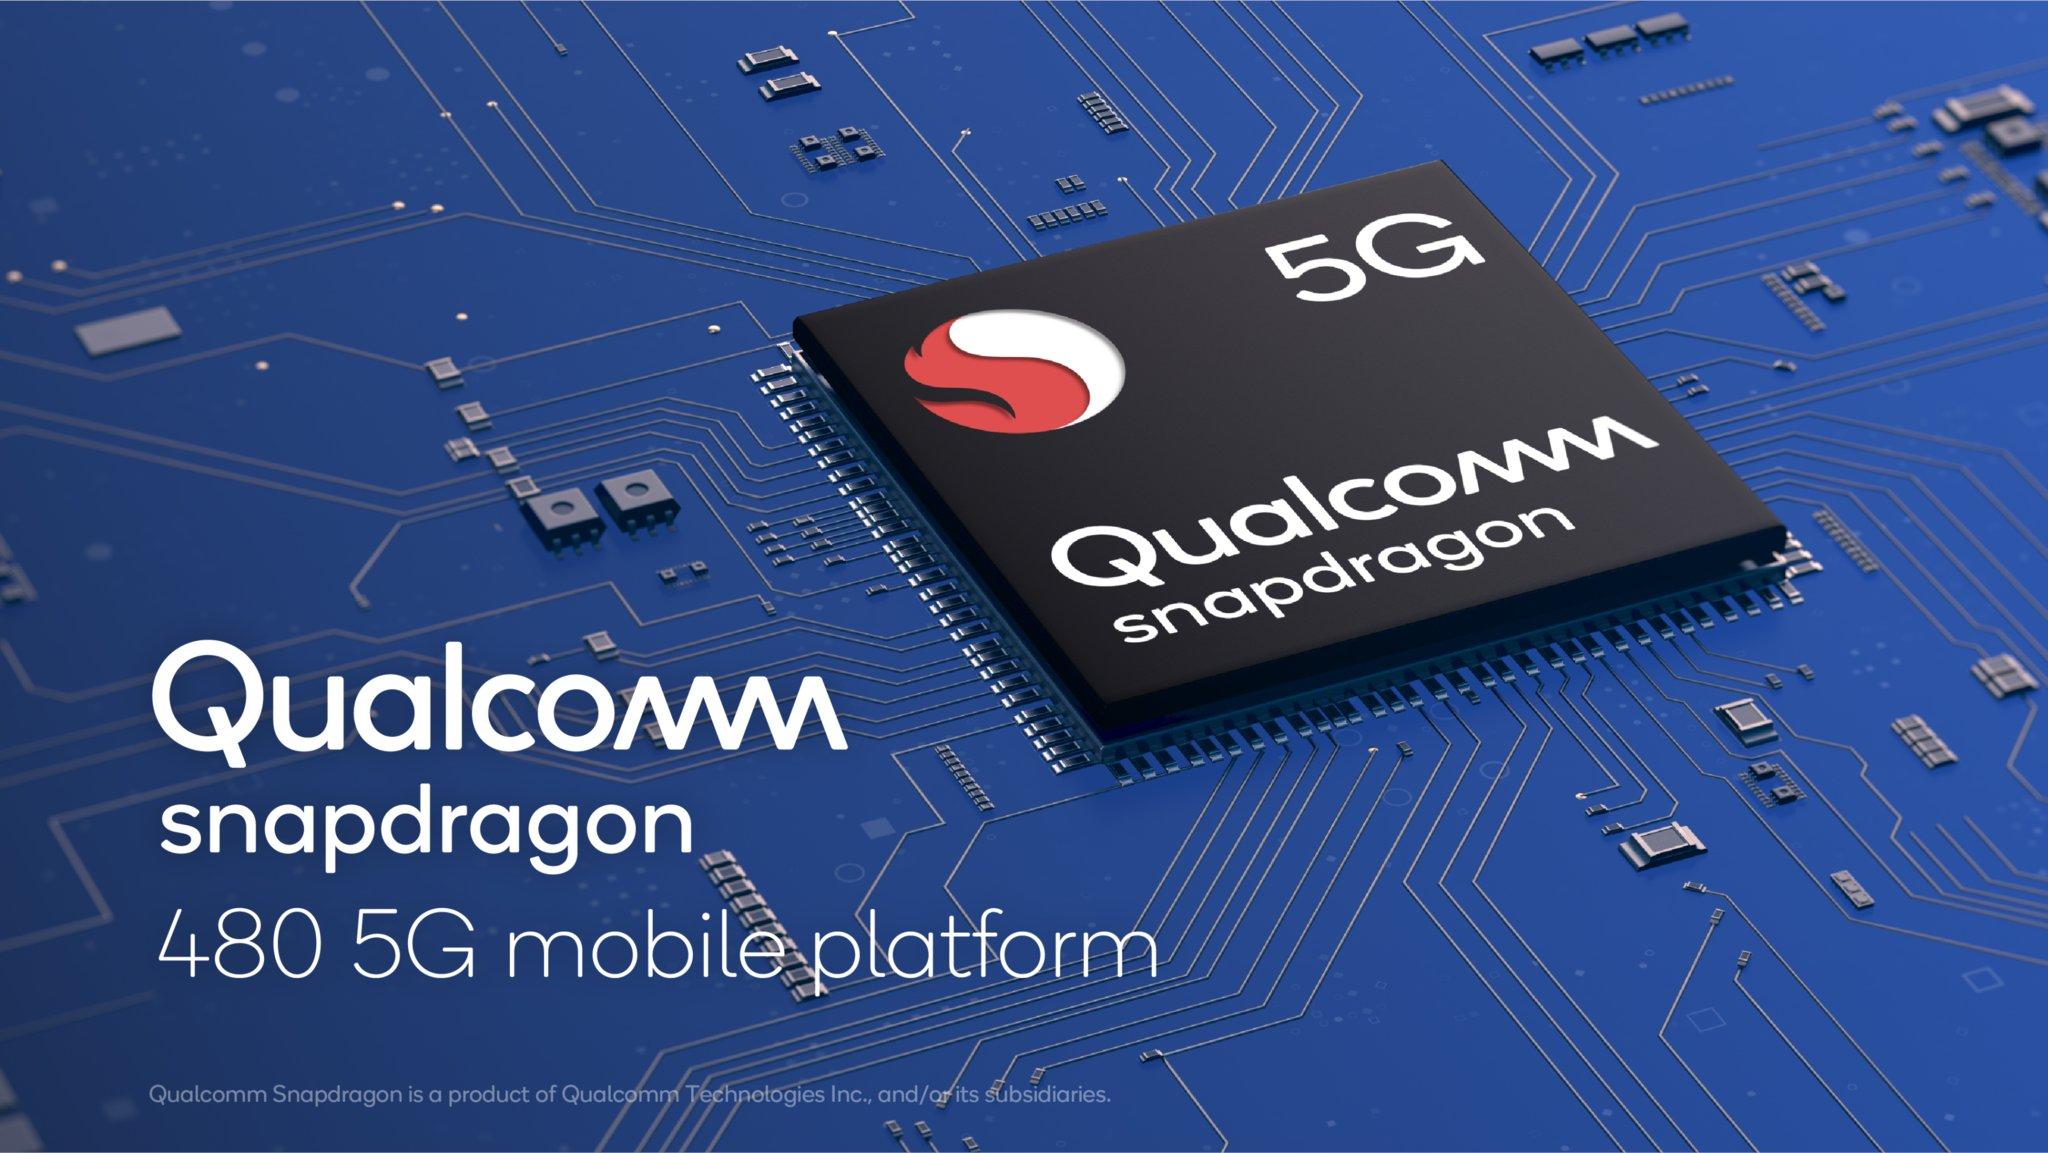 Qualcomm Snapdragon 5G (fot. Qualcomm)